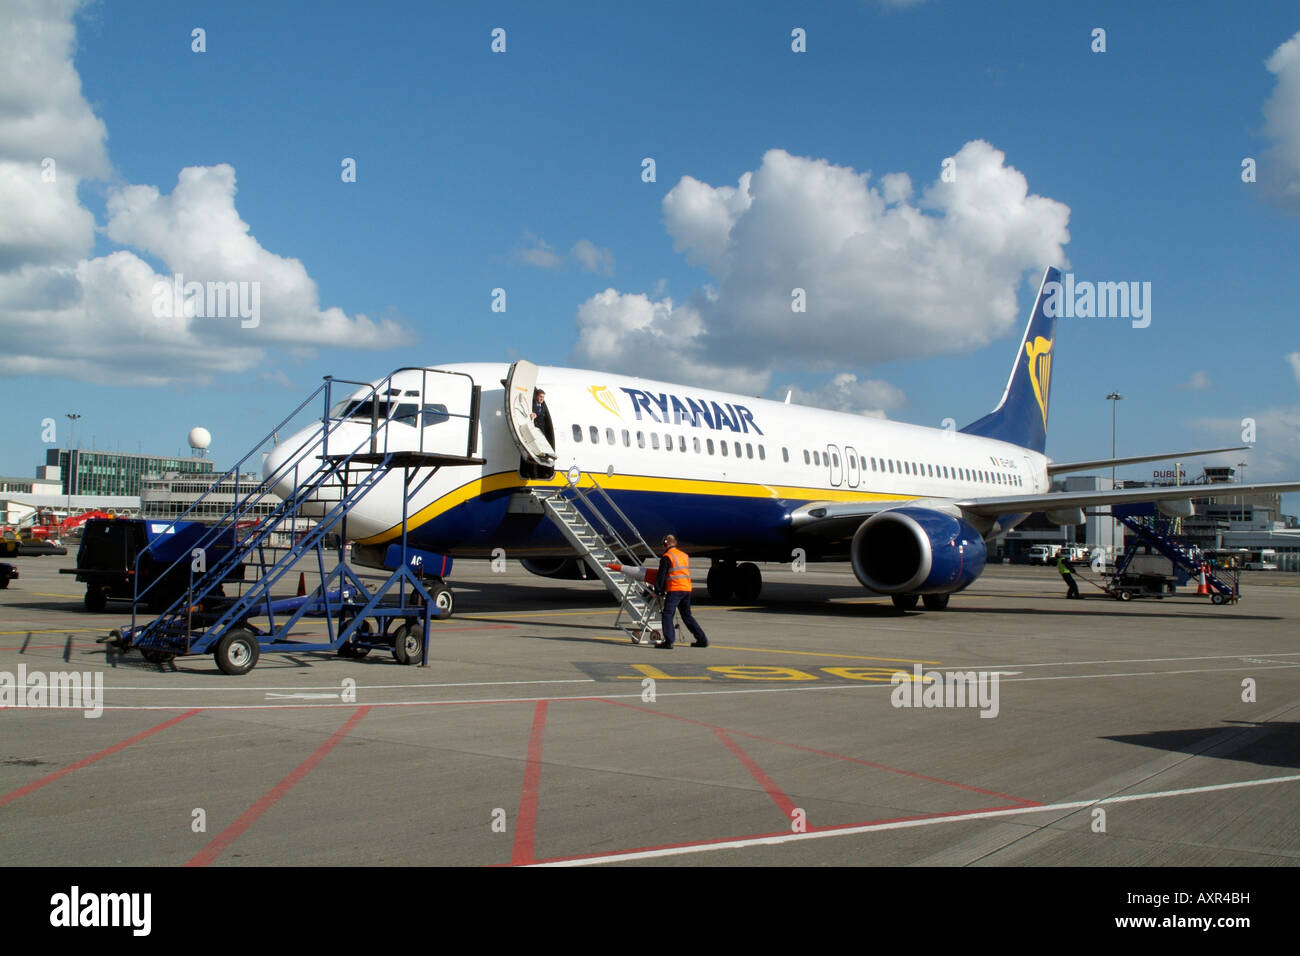 Ryanair Boeing 737 800 Jet aircraft at Dublin International Airport Ireland - Stock Image